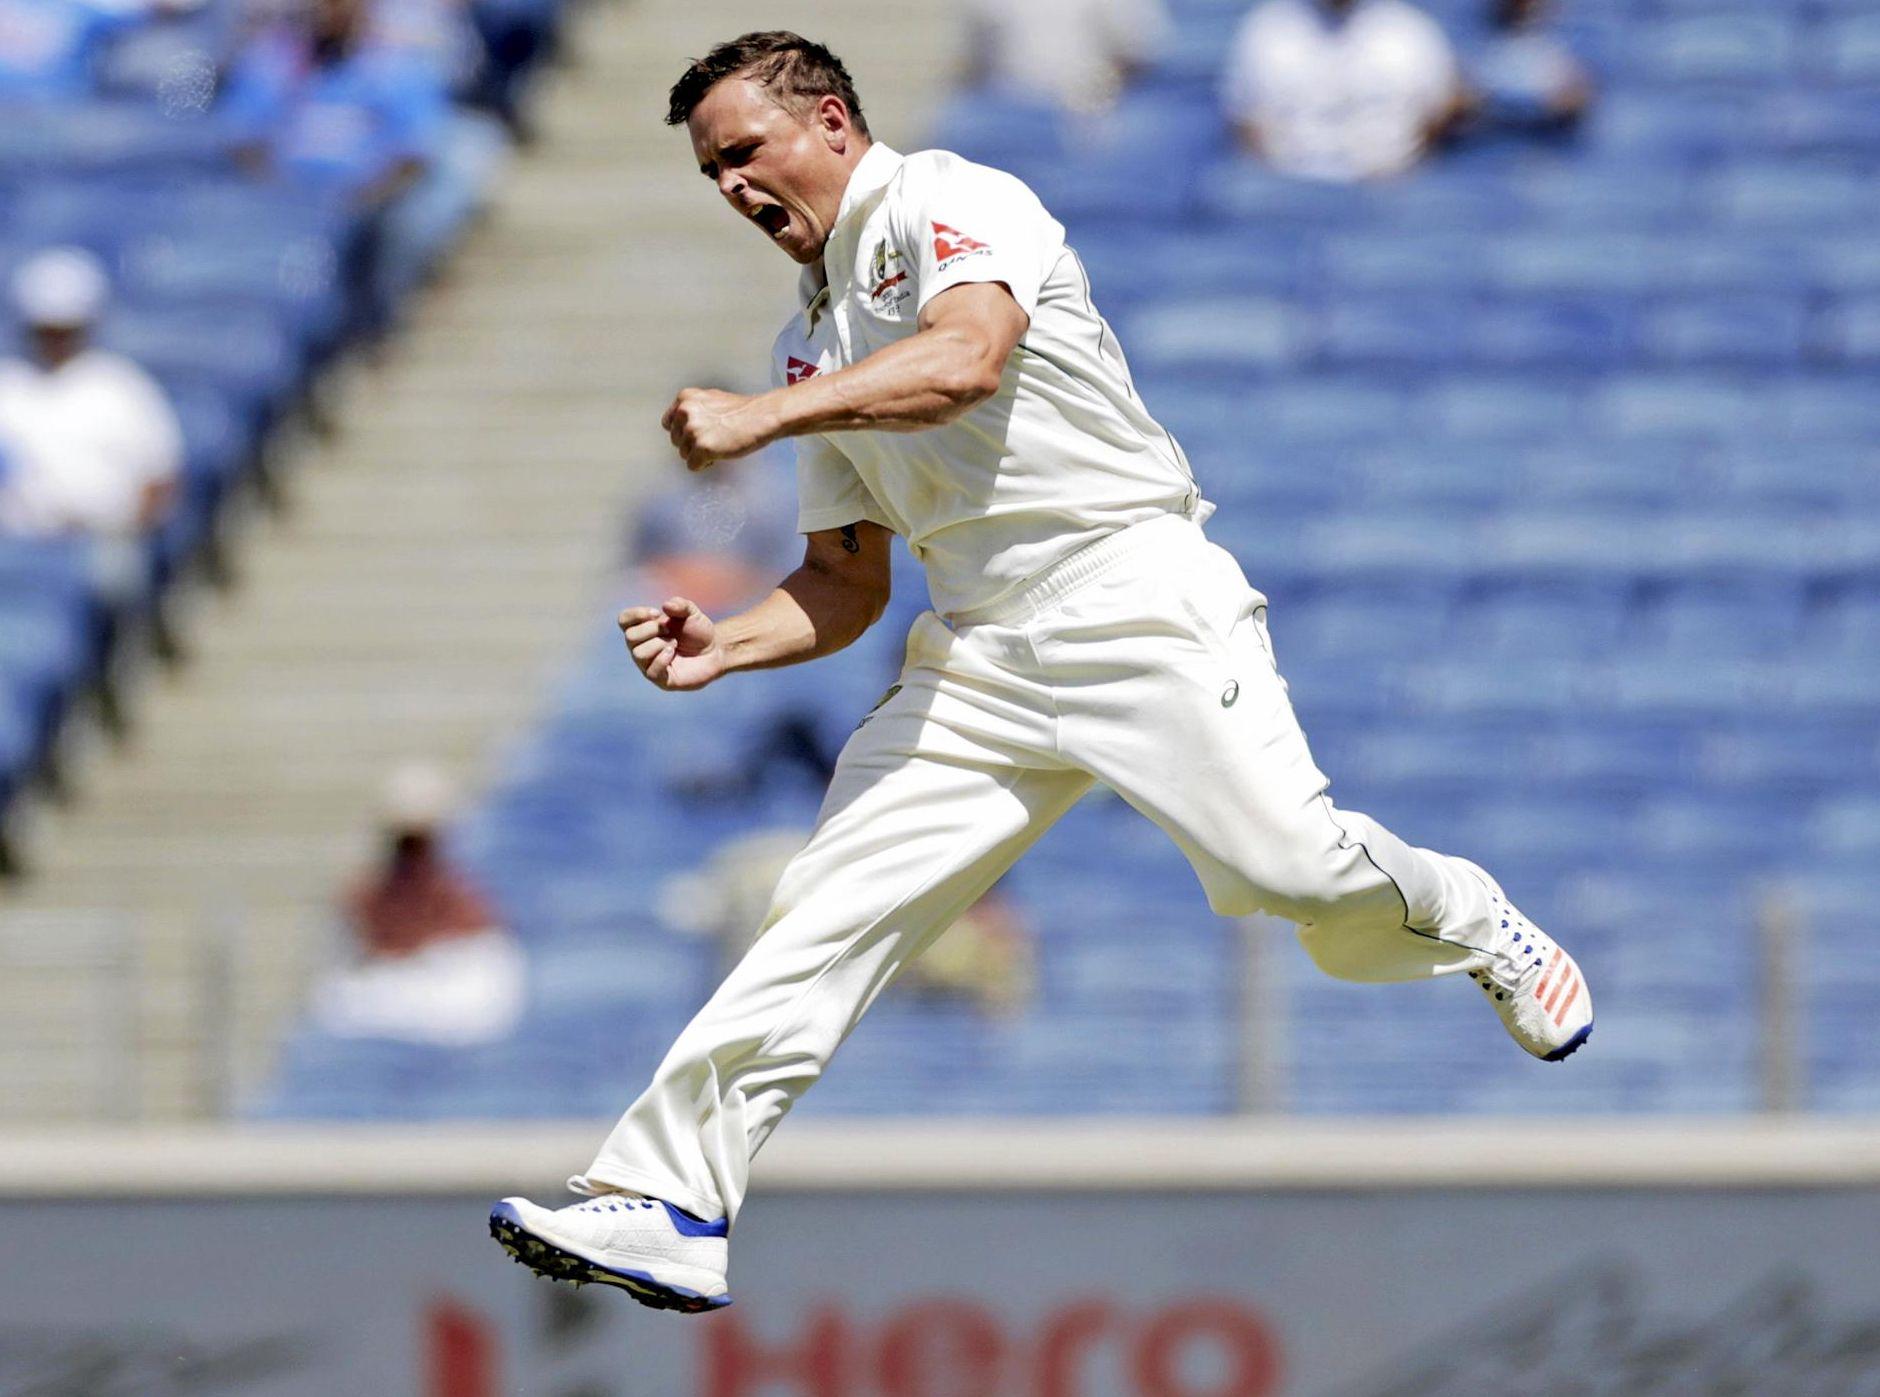 Australia's Steve O'Keefe celebrates the dismissal of India's Virat Kohli during the third day of the first Test.